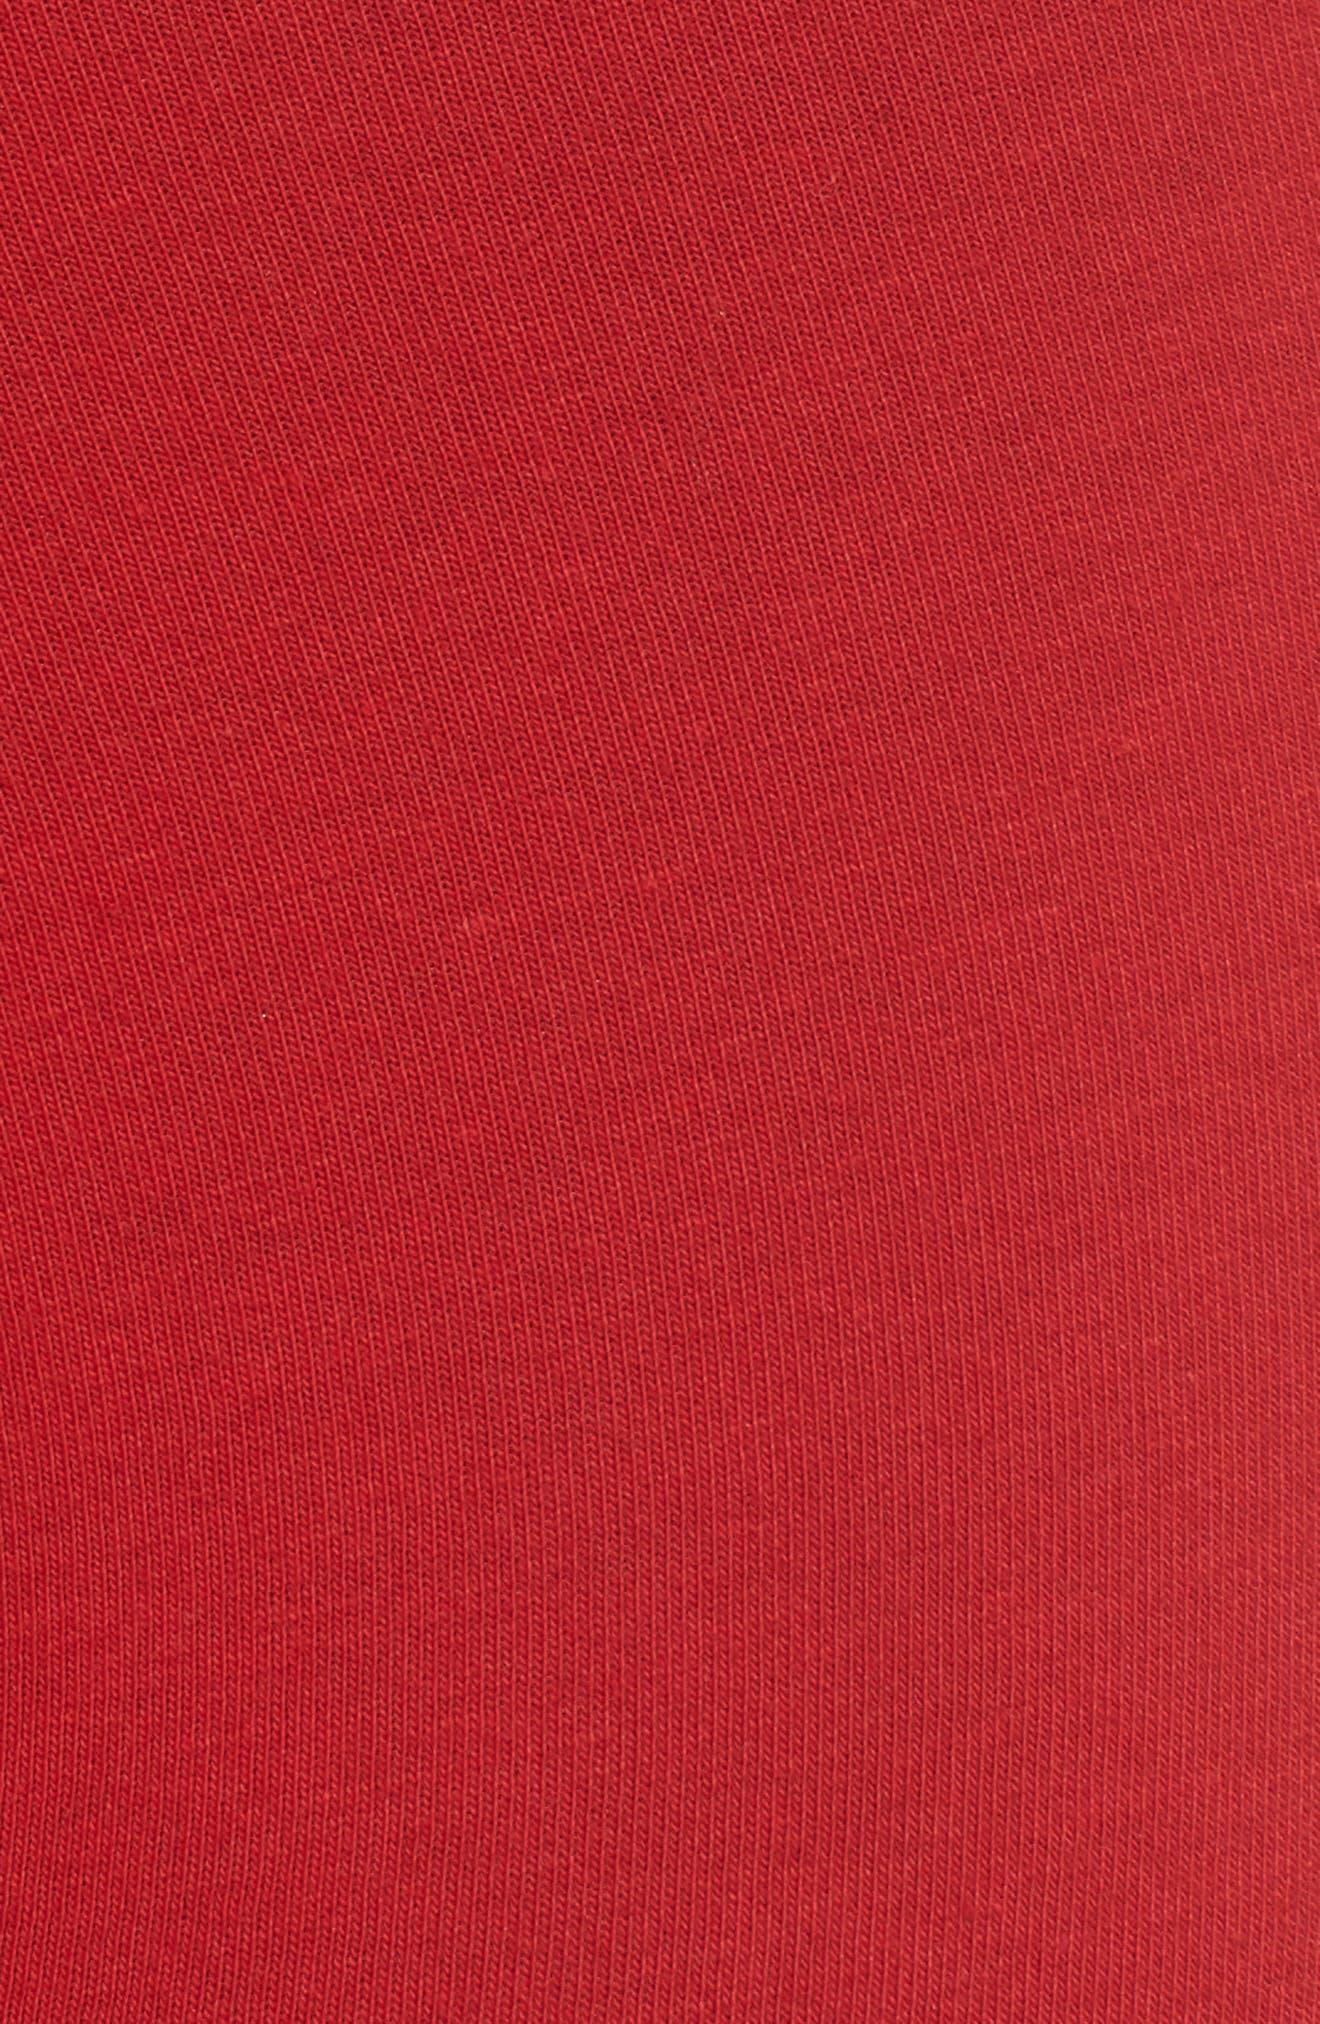 4-Pack Cotton Trunks,                             Alternate thumbnail 6, color,                             BLACK/ RED/ GREY SKY